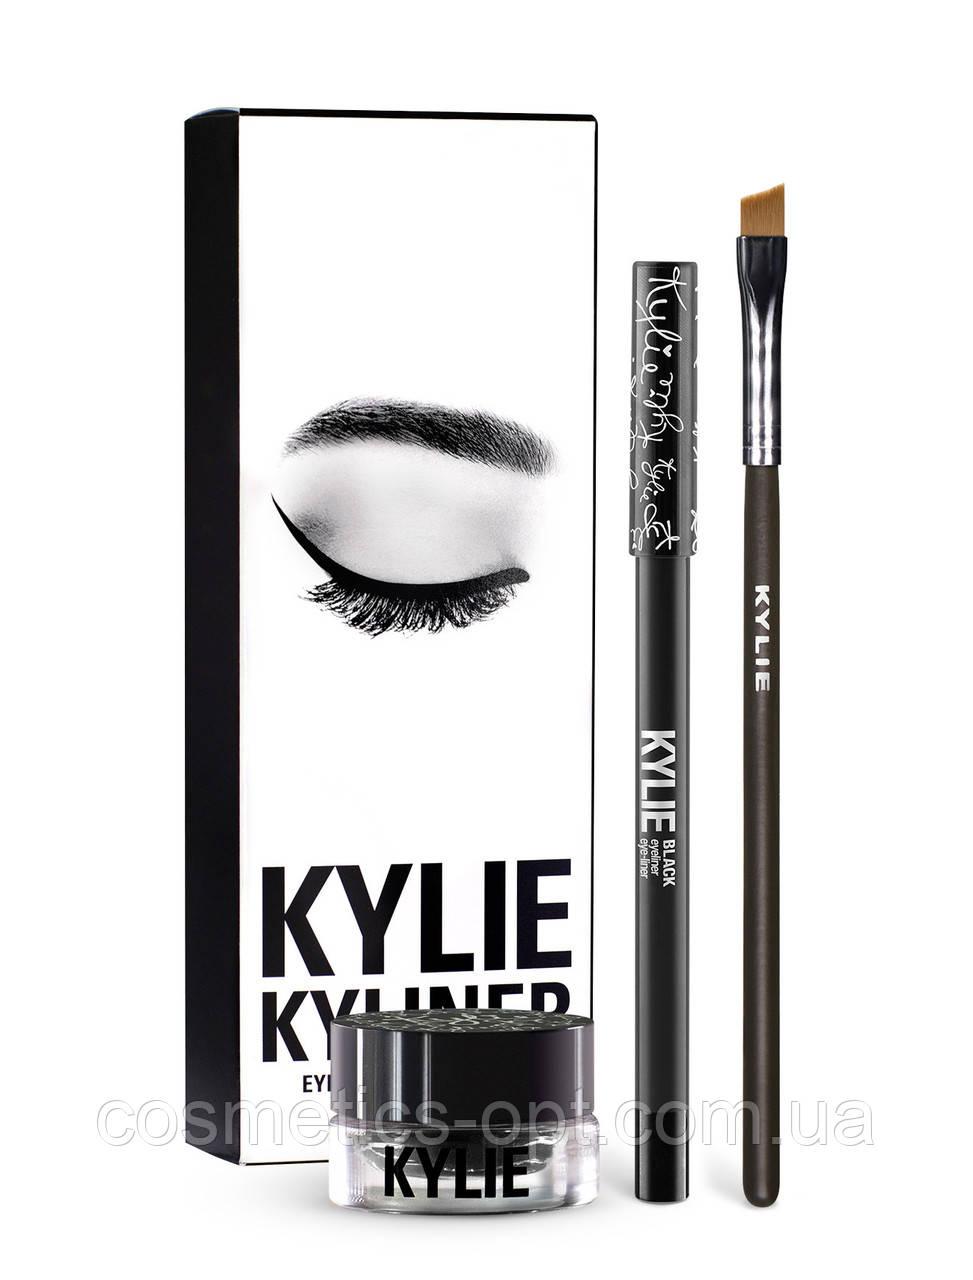 Гелевая подводка для глаз Kylie Kyliner Black (реплика)